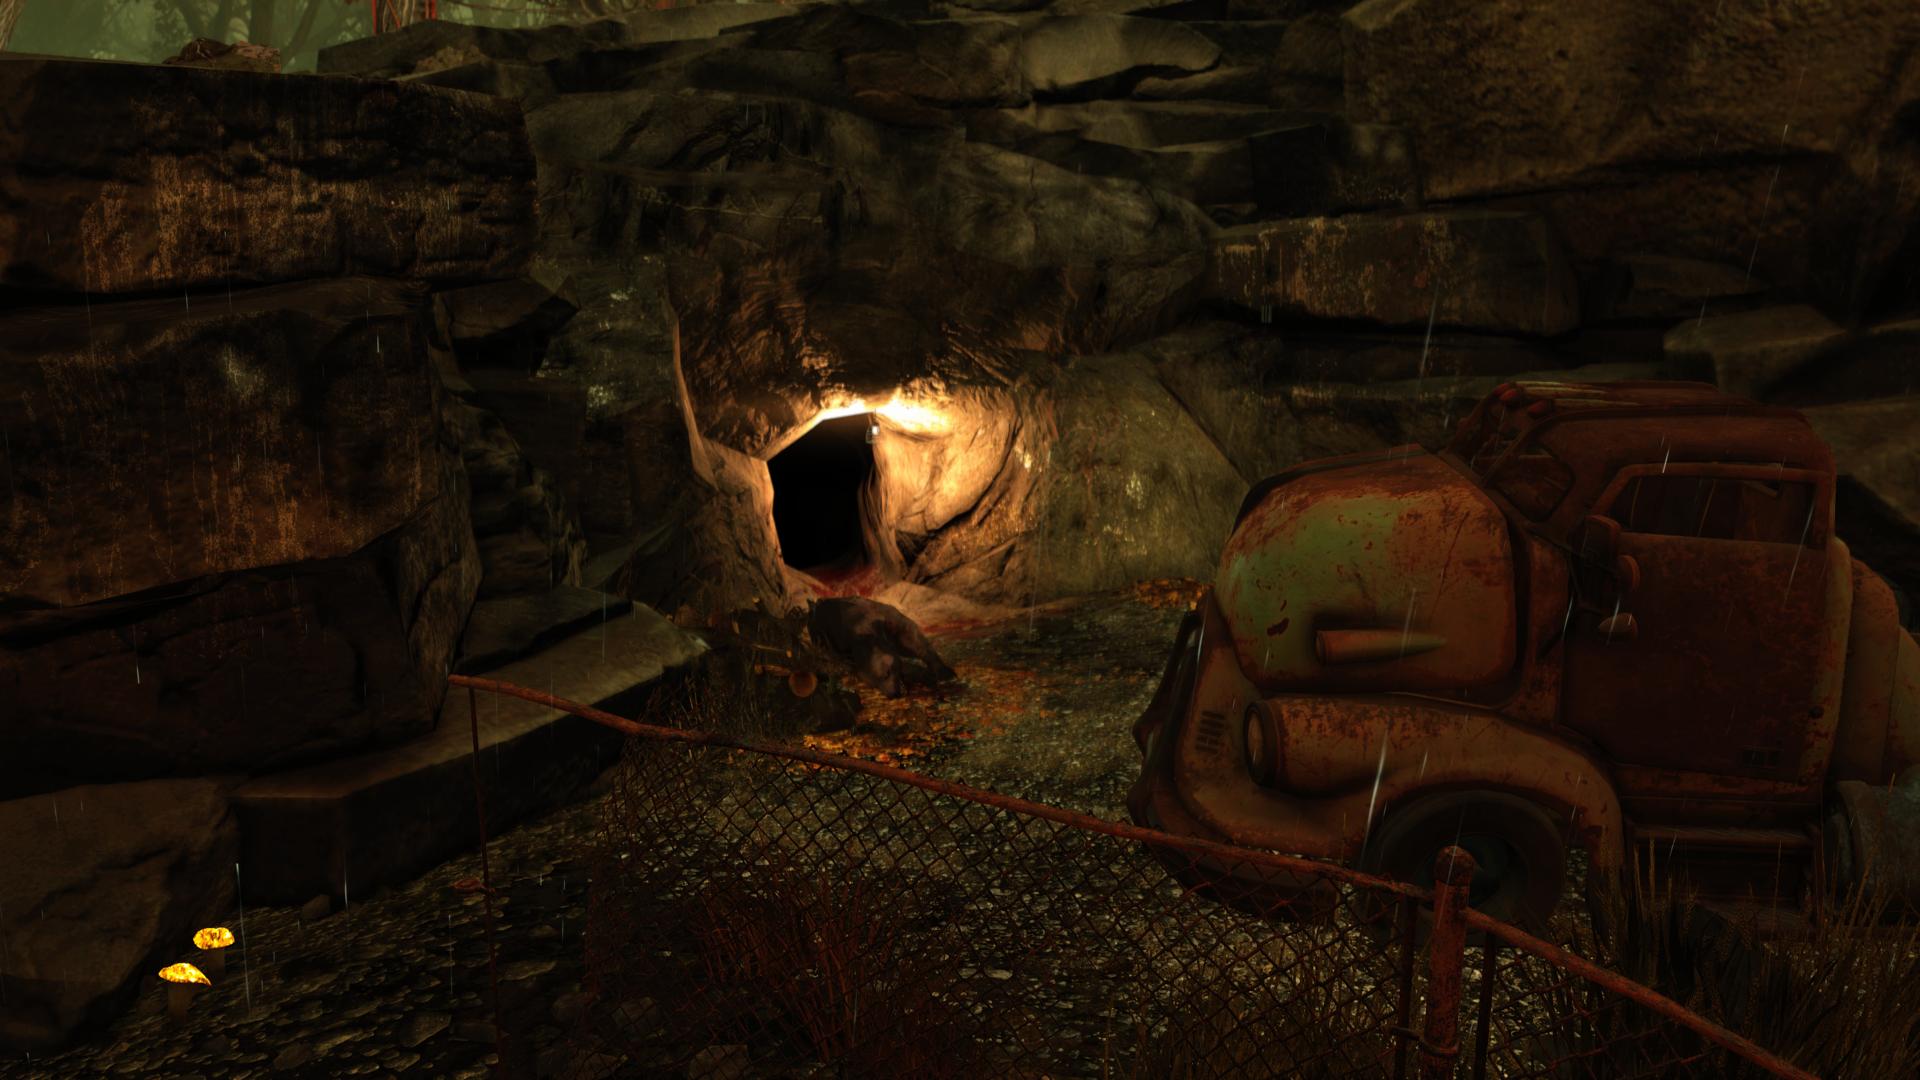 Fo76 Abandoned waste dump cave BETA